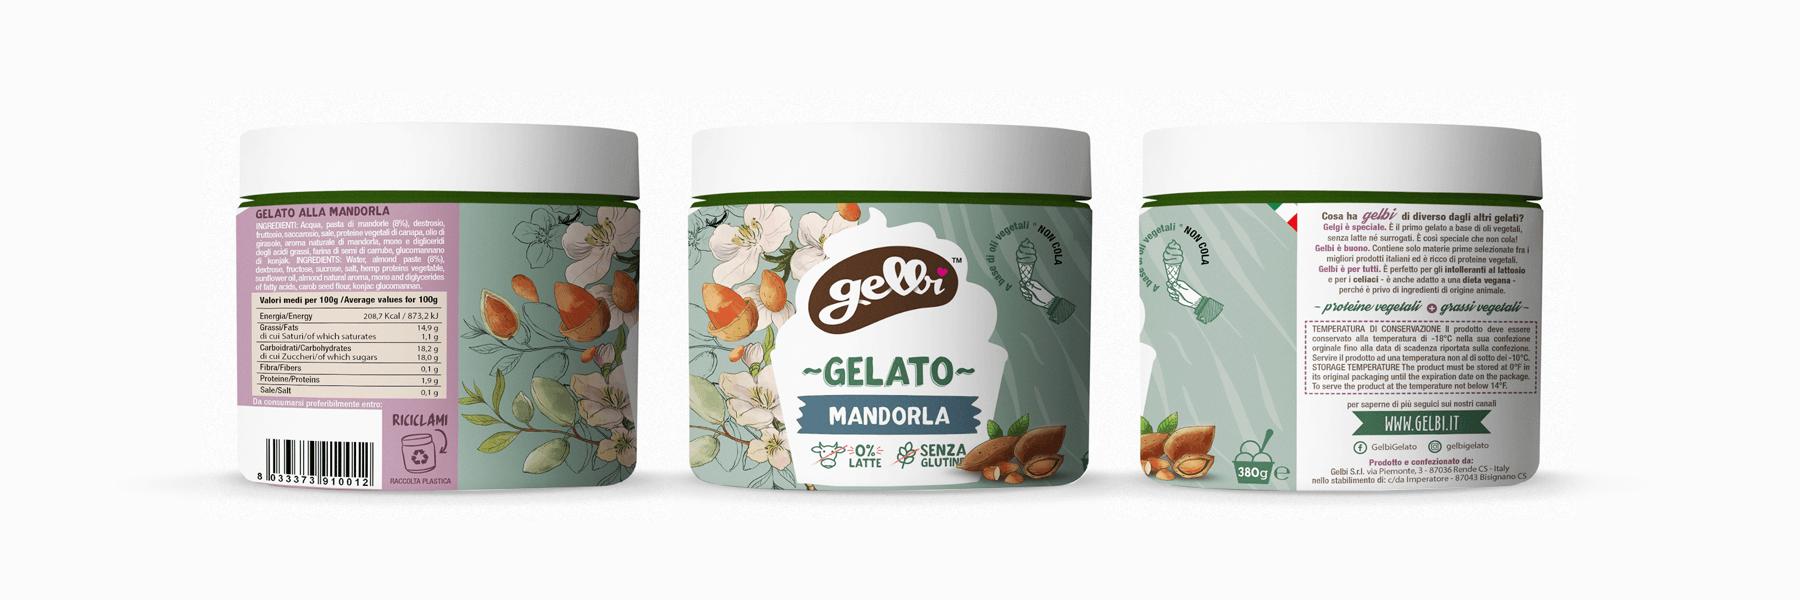 Studio La Regina - gelato Gelbi alla mandorla